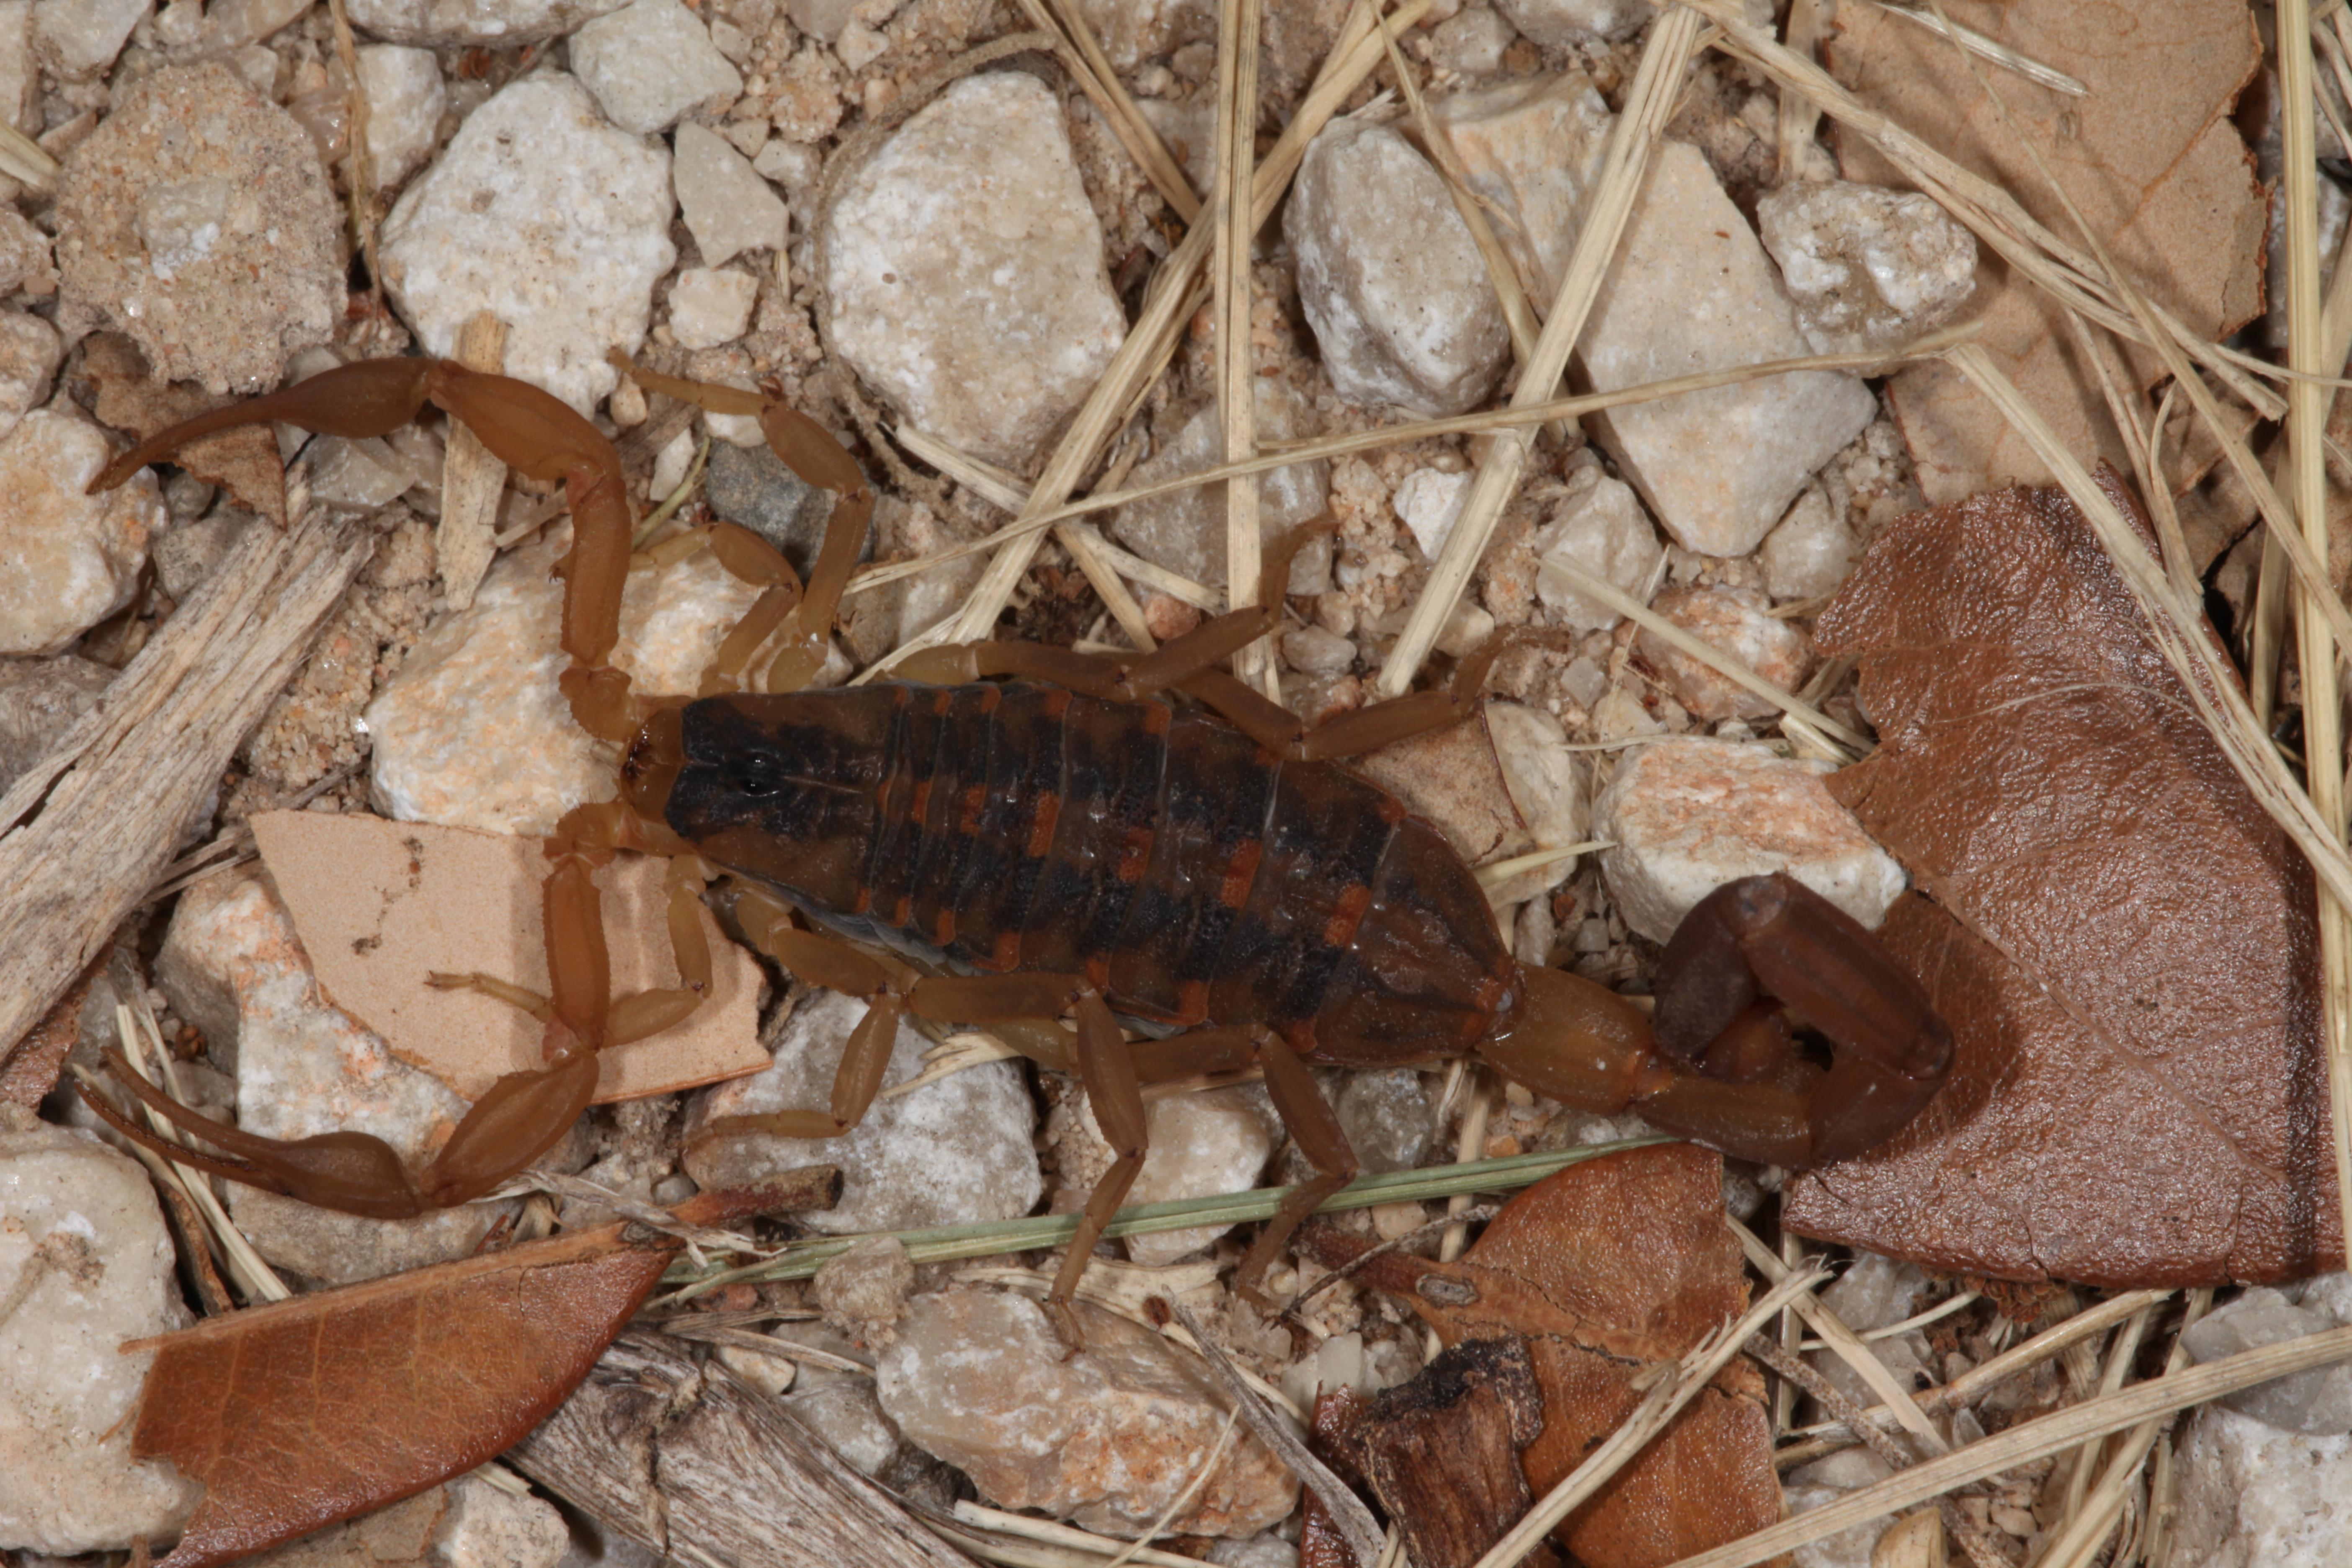 Scorpion, Arachnid, Close, Insect, Macro, HQ Photo